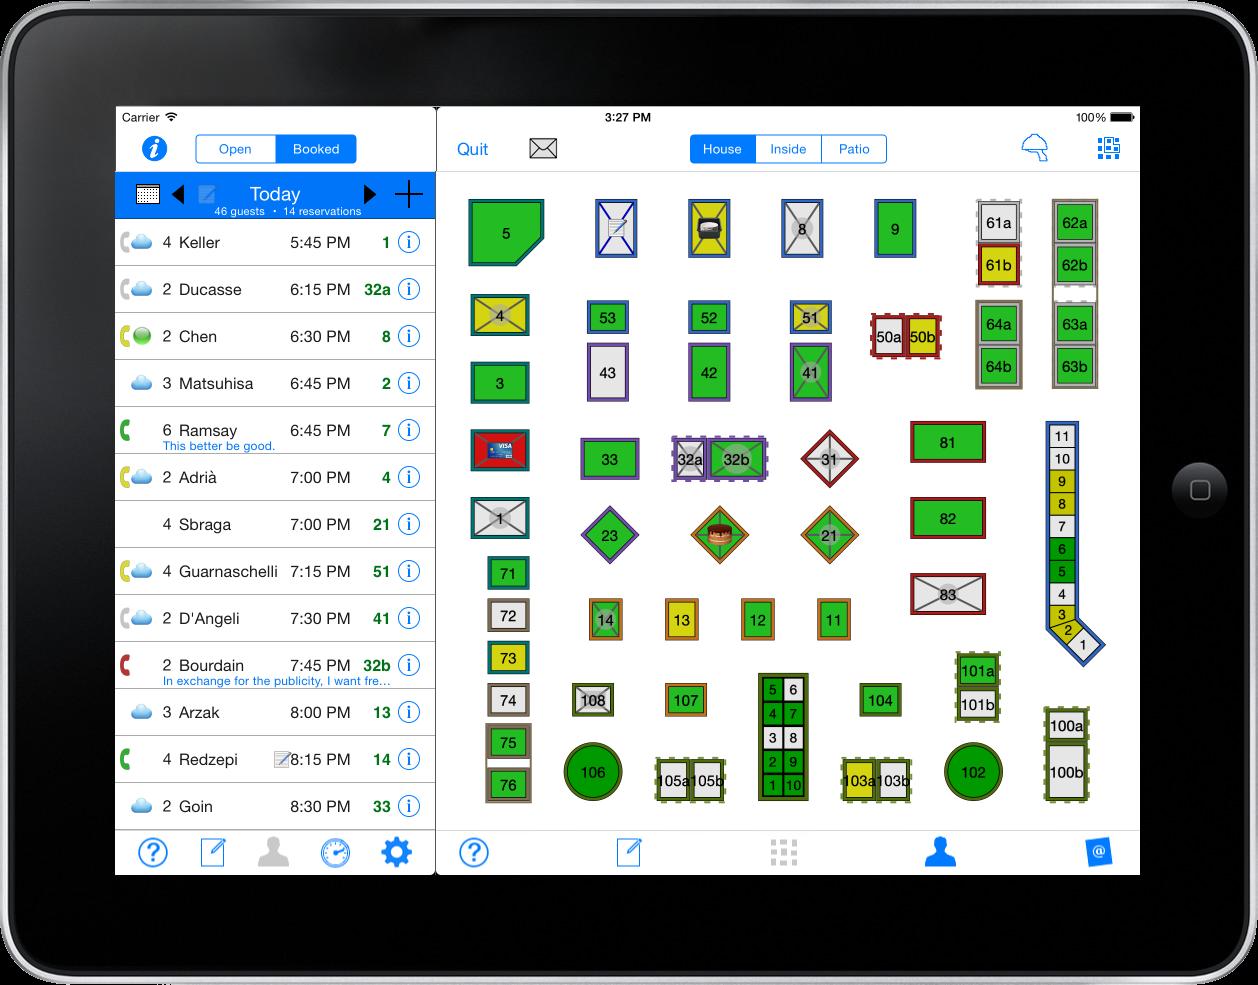 Restaurant seating chart app ipad seating chart apps for Restaurant seating chart app